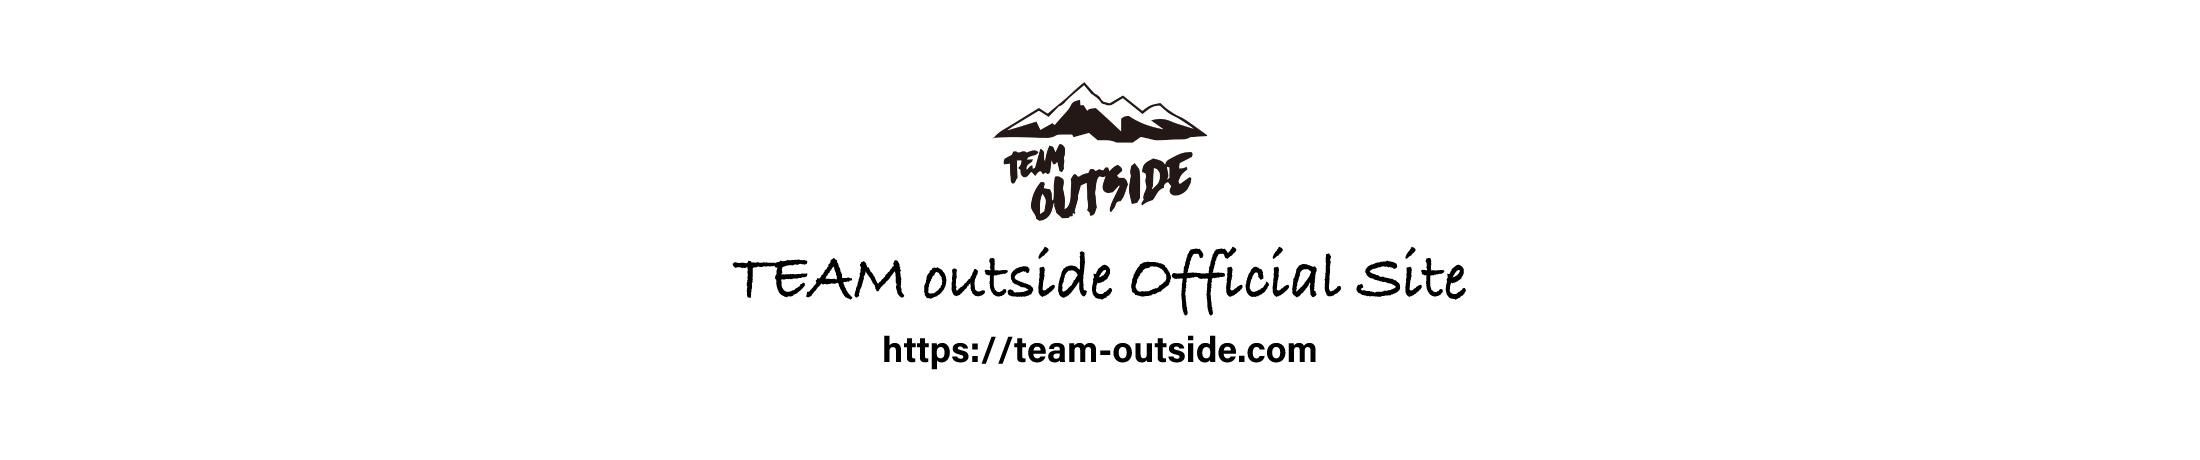 teamoutside,official